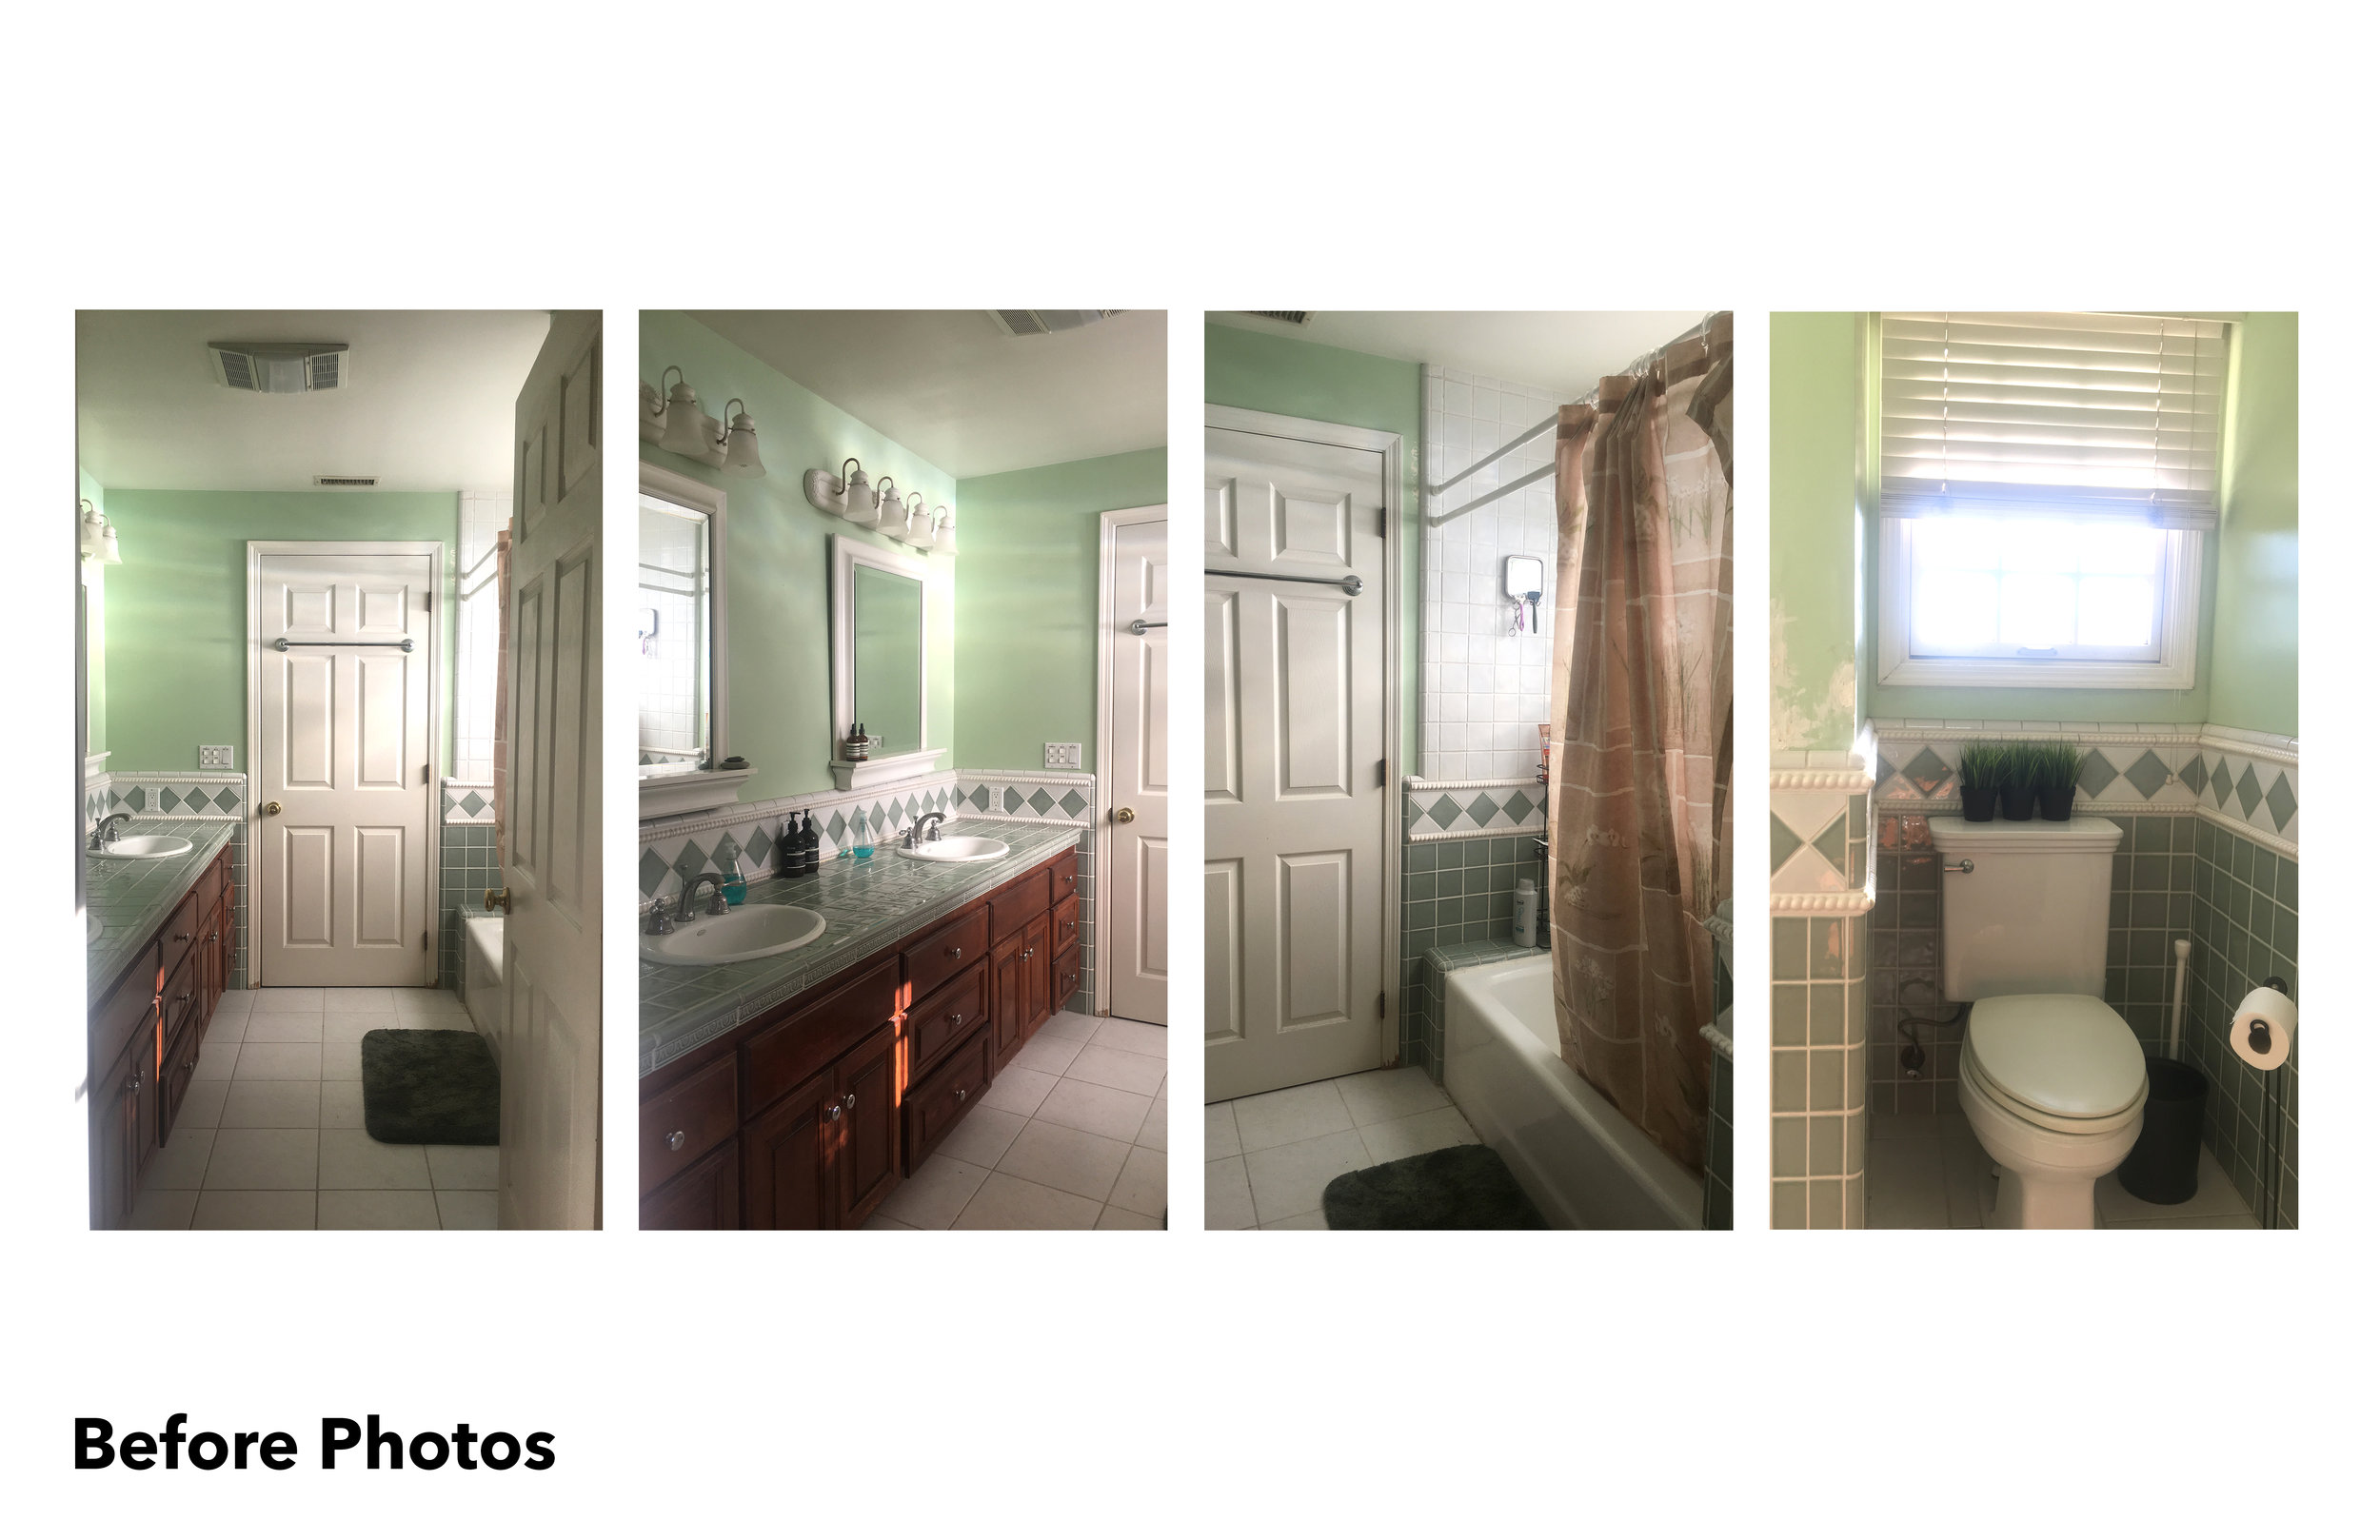 Material_Before_Photos.jpg